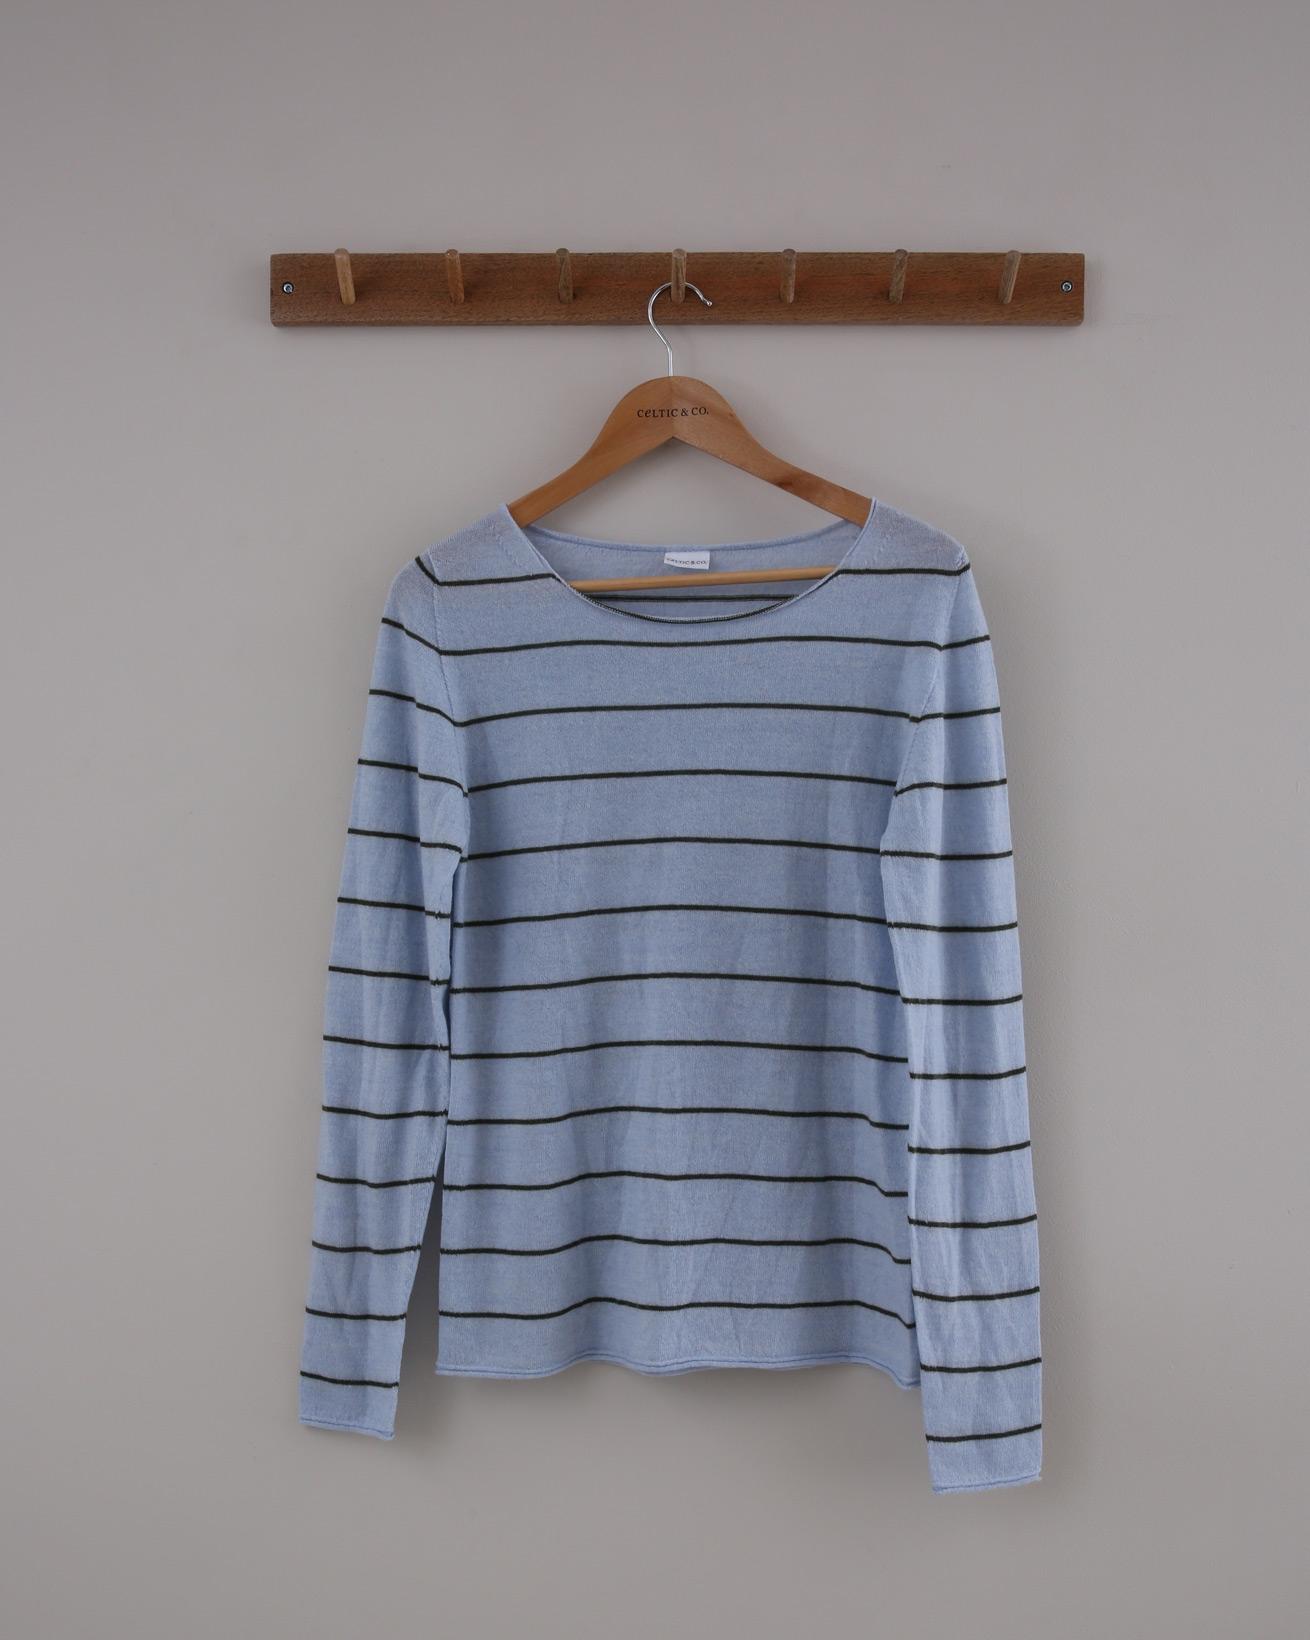 Fine Knit Merino Crew Jumper - Small - Vintage Blue & Olive Stripe - 1401